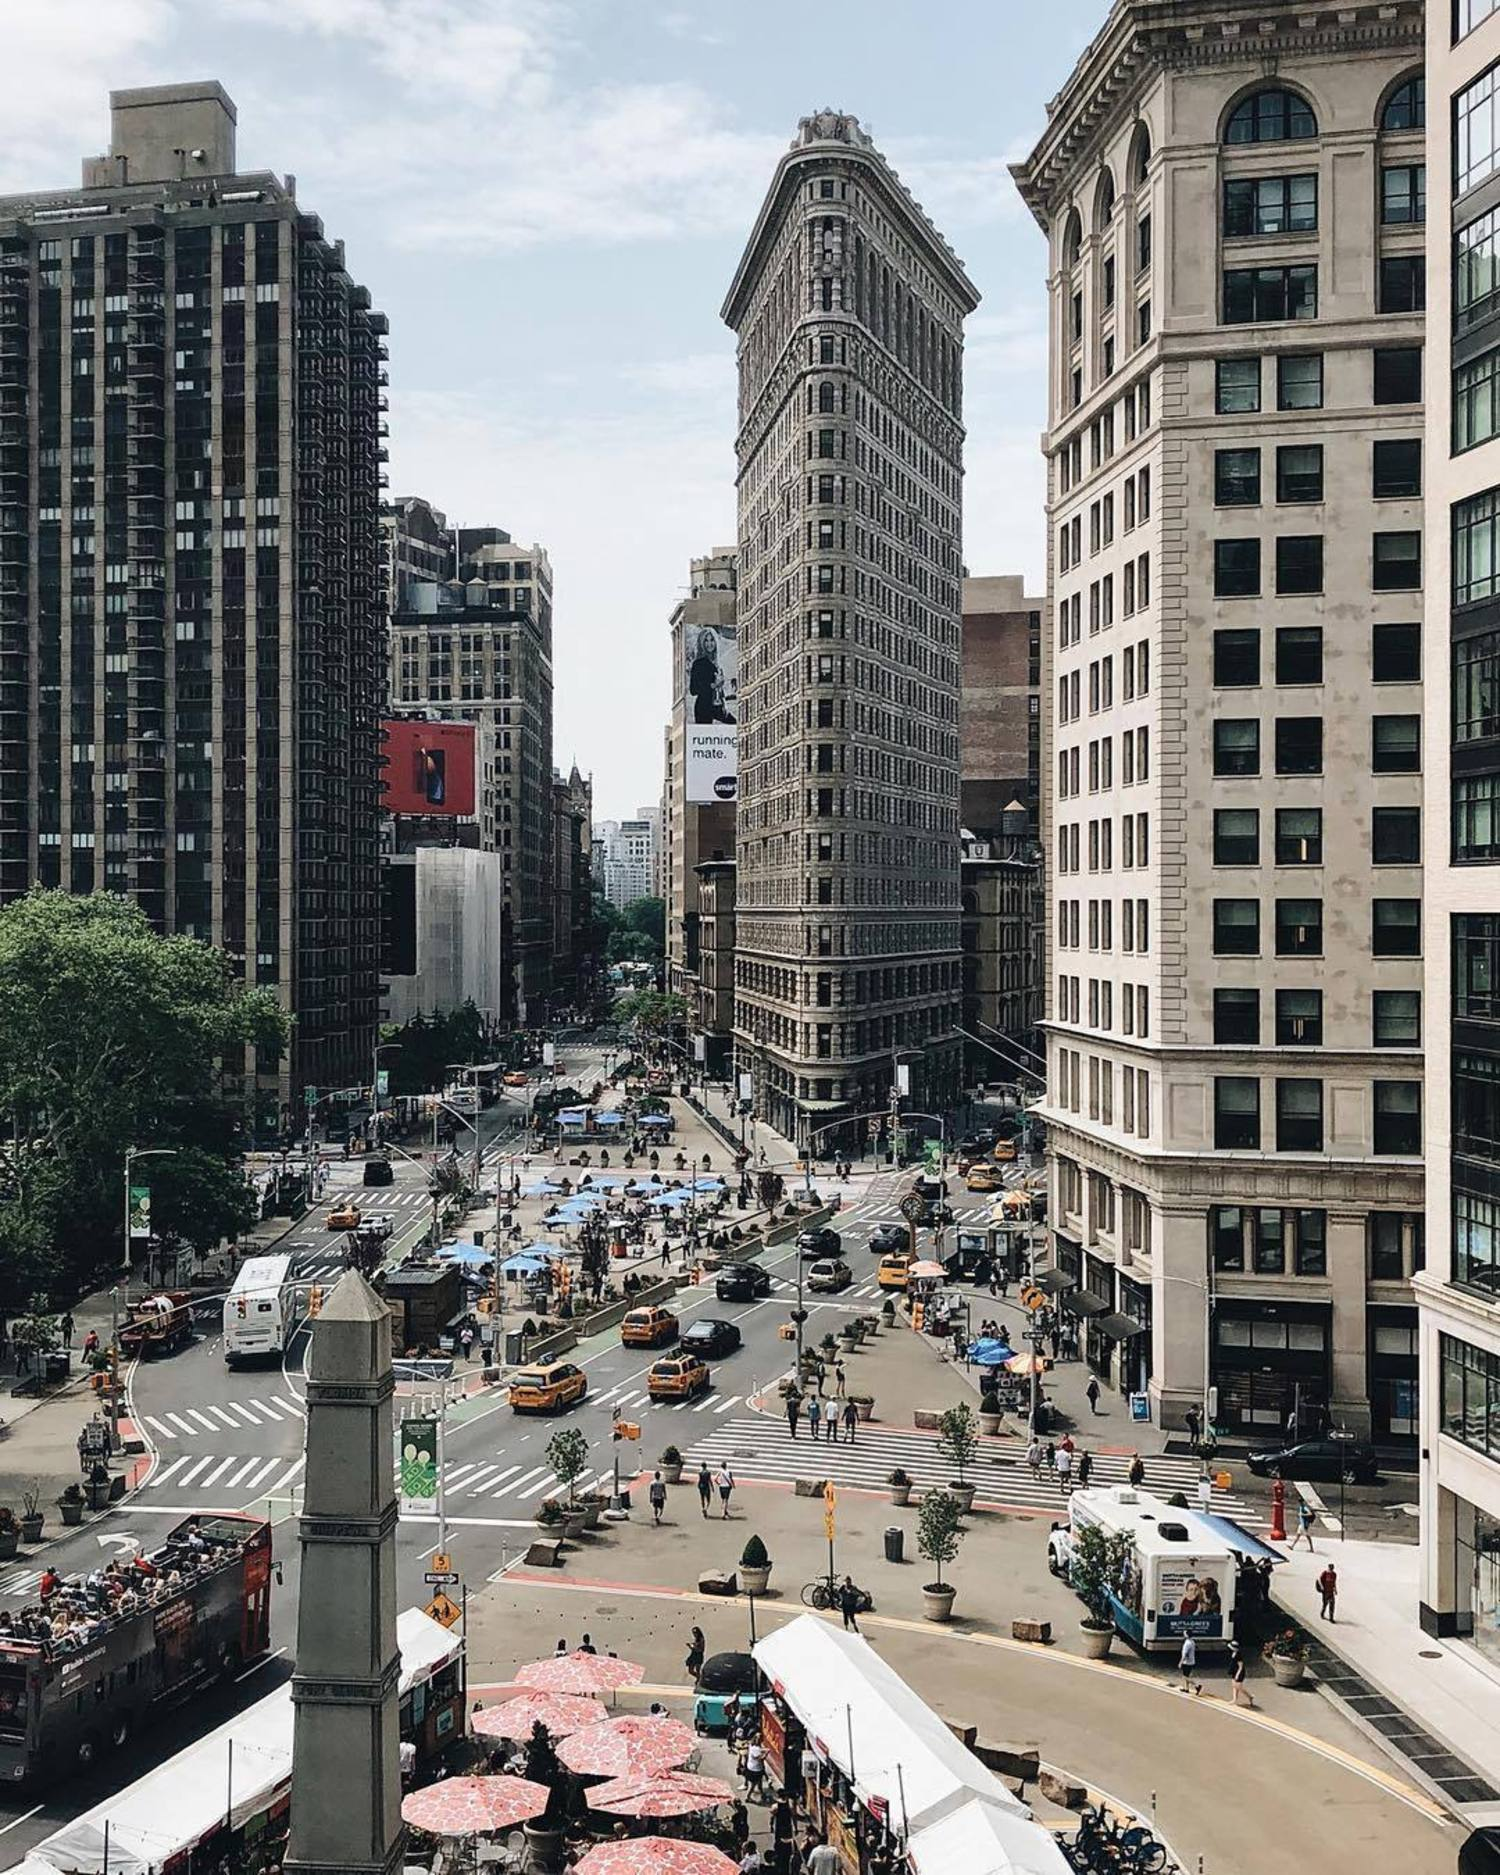 Flatiron Building, Manhattan. Photo via @iwyndt #viewingnyc #newyork #newyorkcity #nyc #flatironbuilding